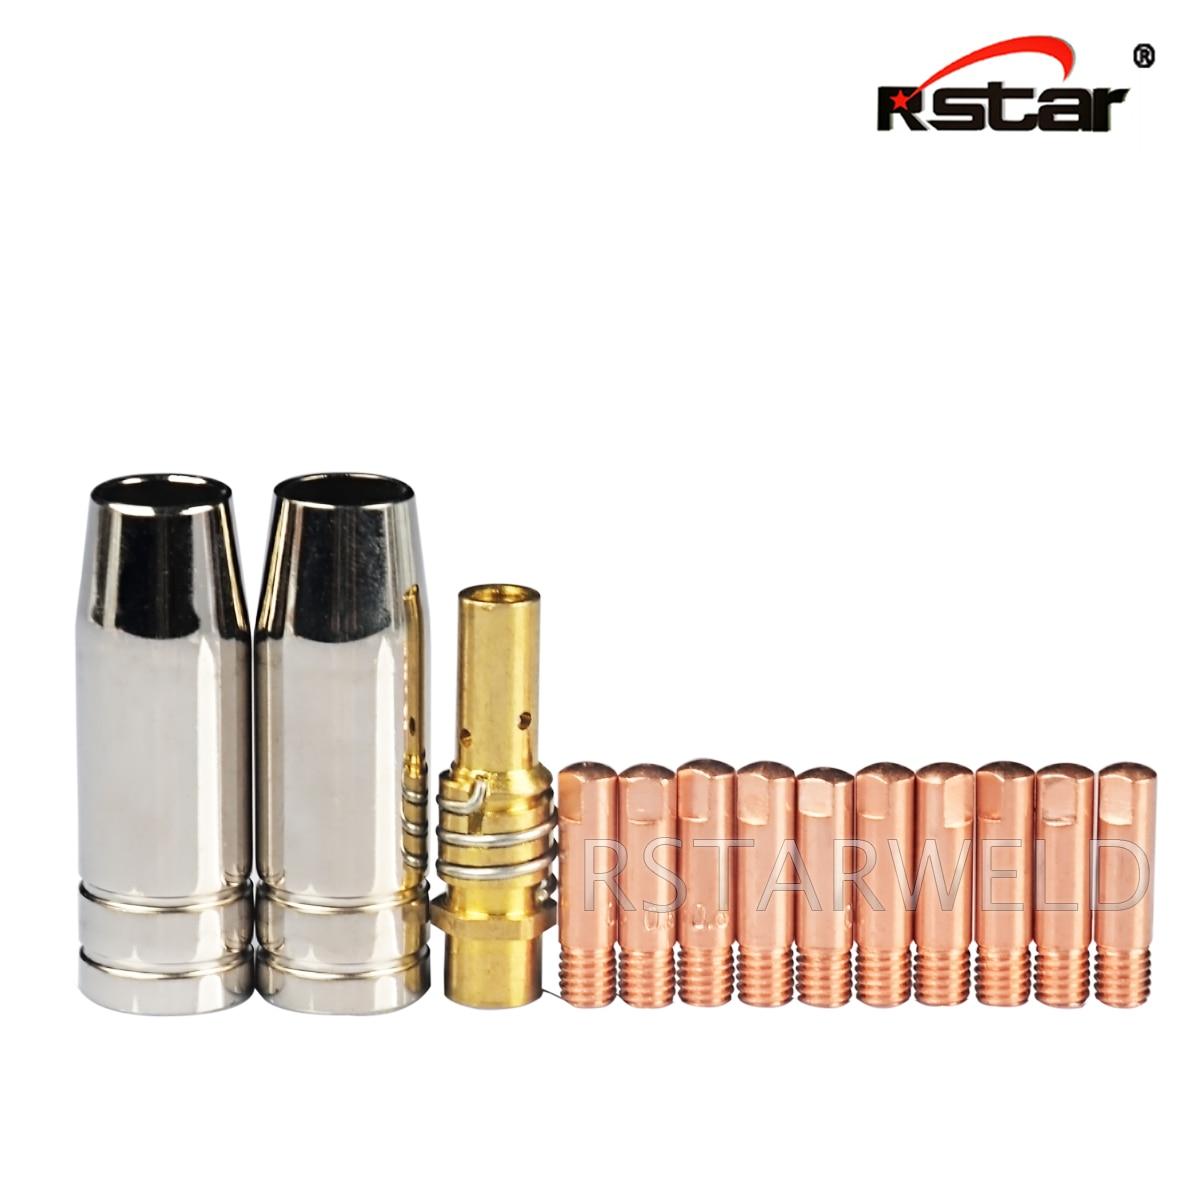 13PCS Mig Welding Nozzle Welder Torch Nozzles Consumables Gold Tip Holder Contact Tips Gas Nozzle Set 15AK MB15 Mig Torch Nozzle